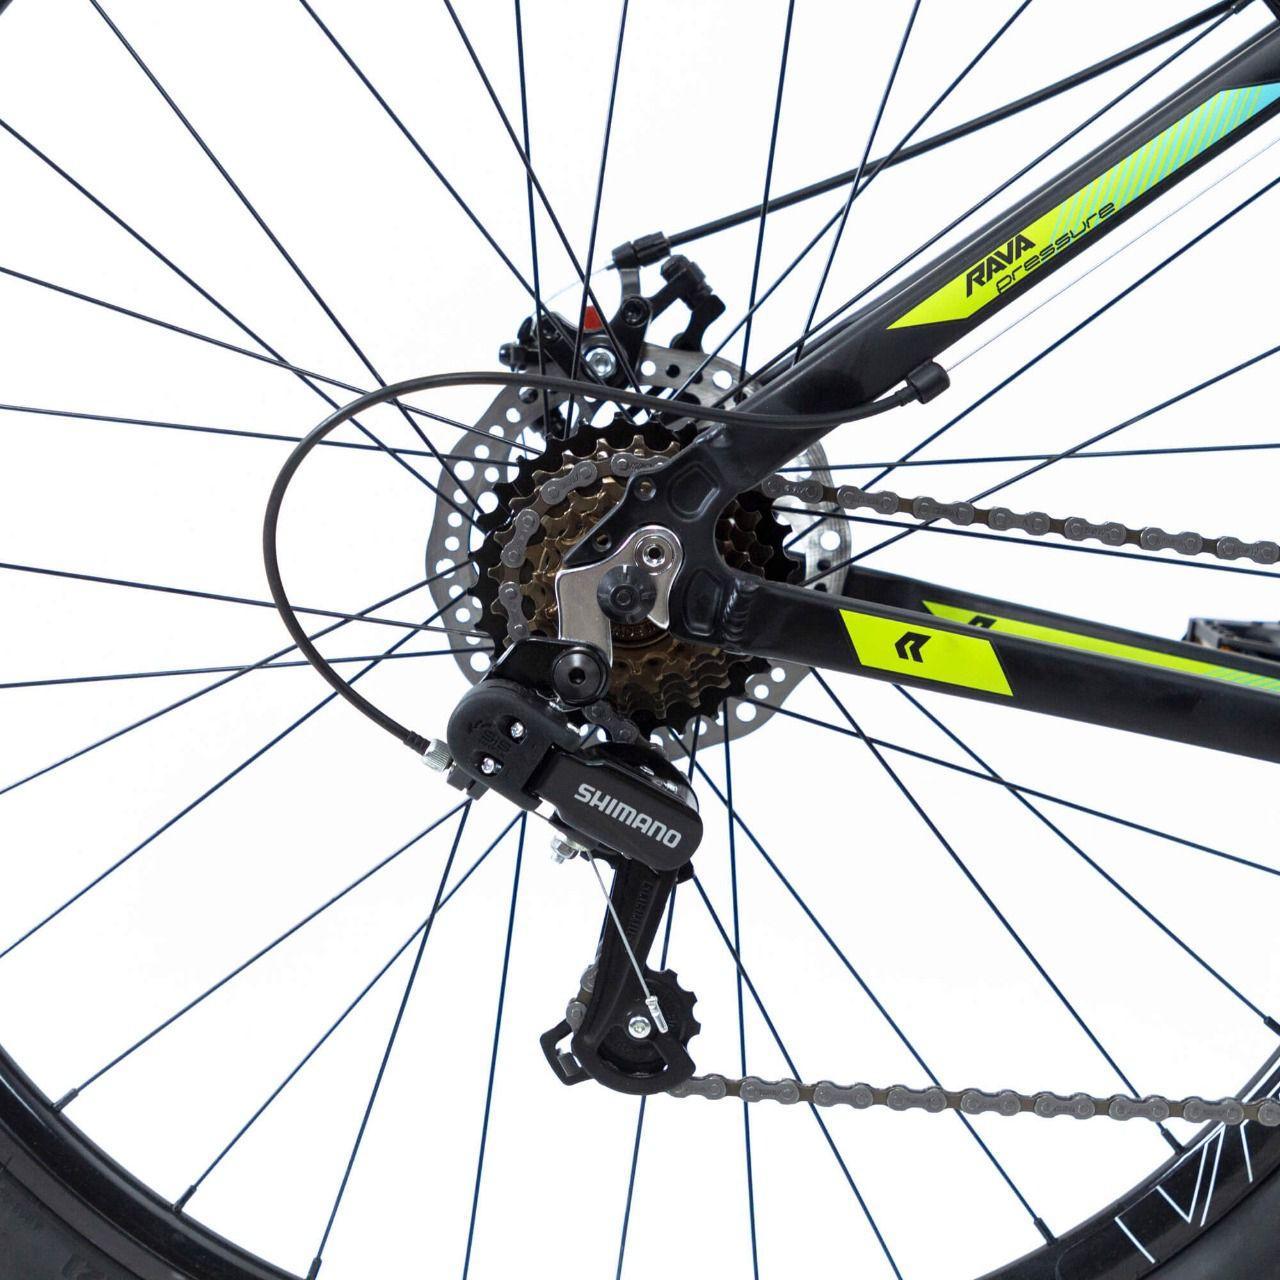 Bicicleta RAVA Pressure aro 29 - 21v Shimano SIS traseiro - Freio a Disco - Preto/Verde/Azul